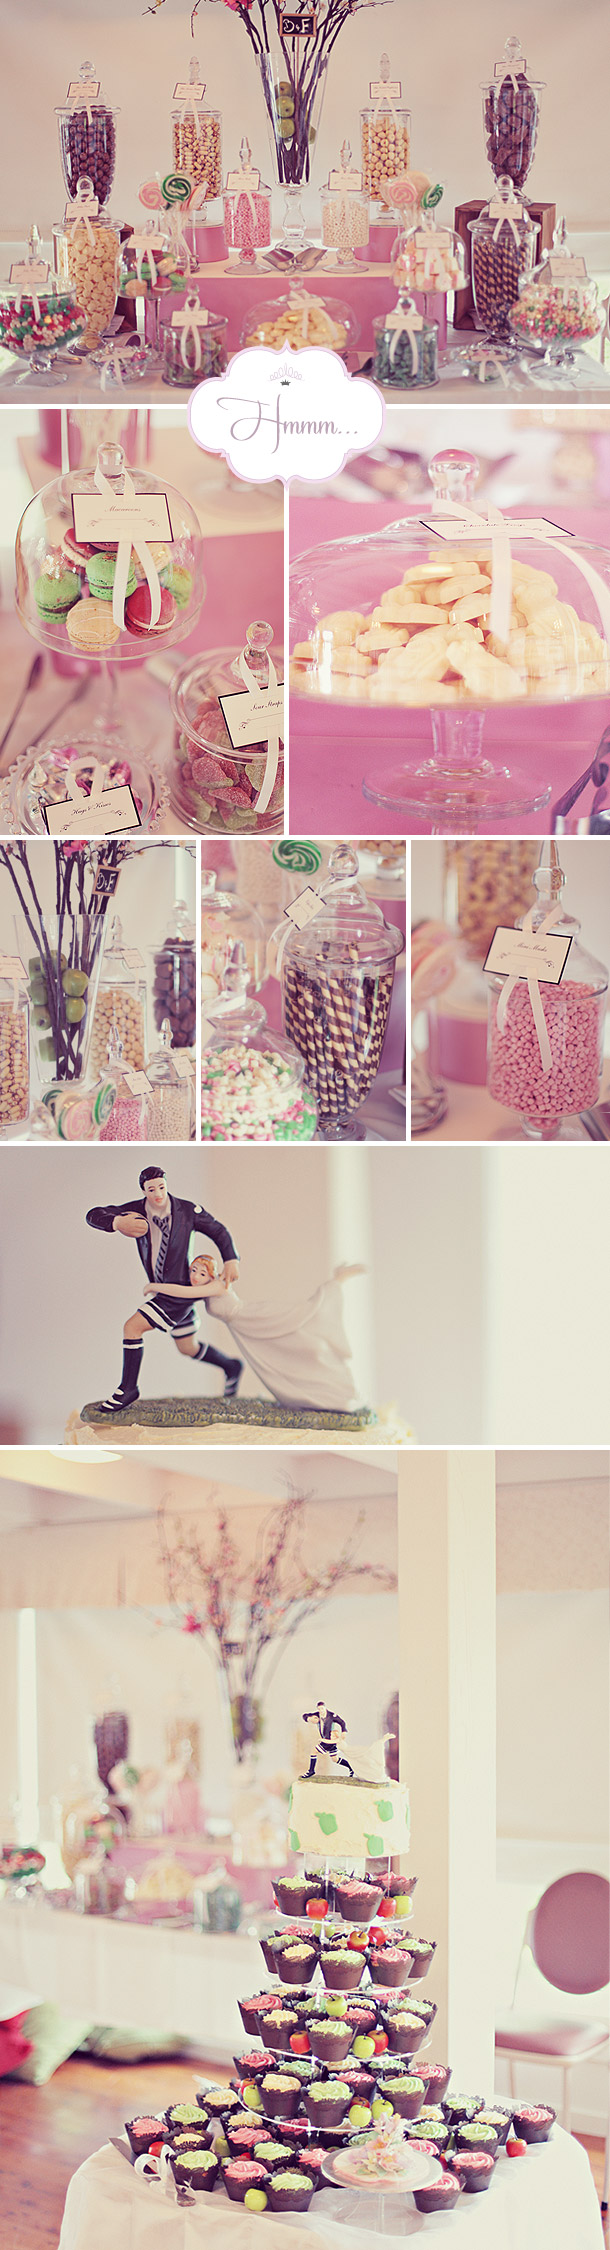 Rosafarbenes Bonbon-Buffet Inspiration